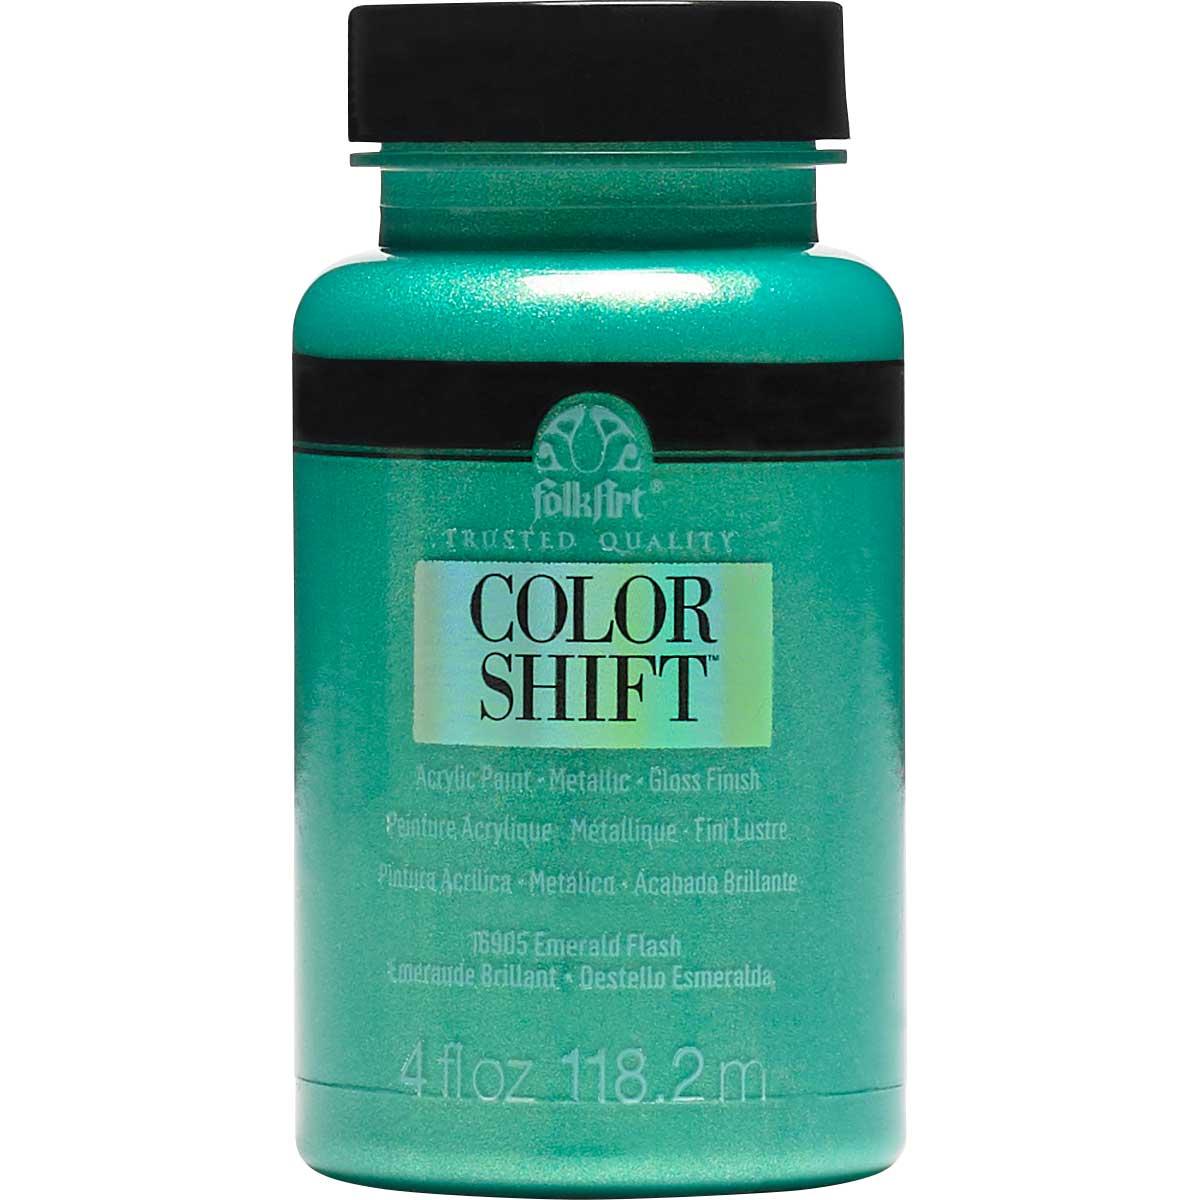 FolkArt ® Color Shift™ Acrylic Paint - Emerald Flash, 4 oz.